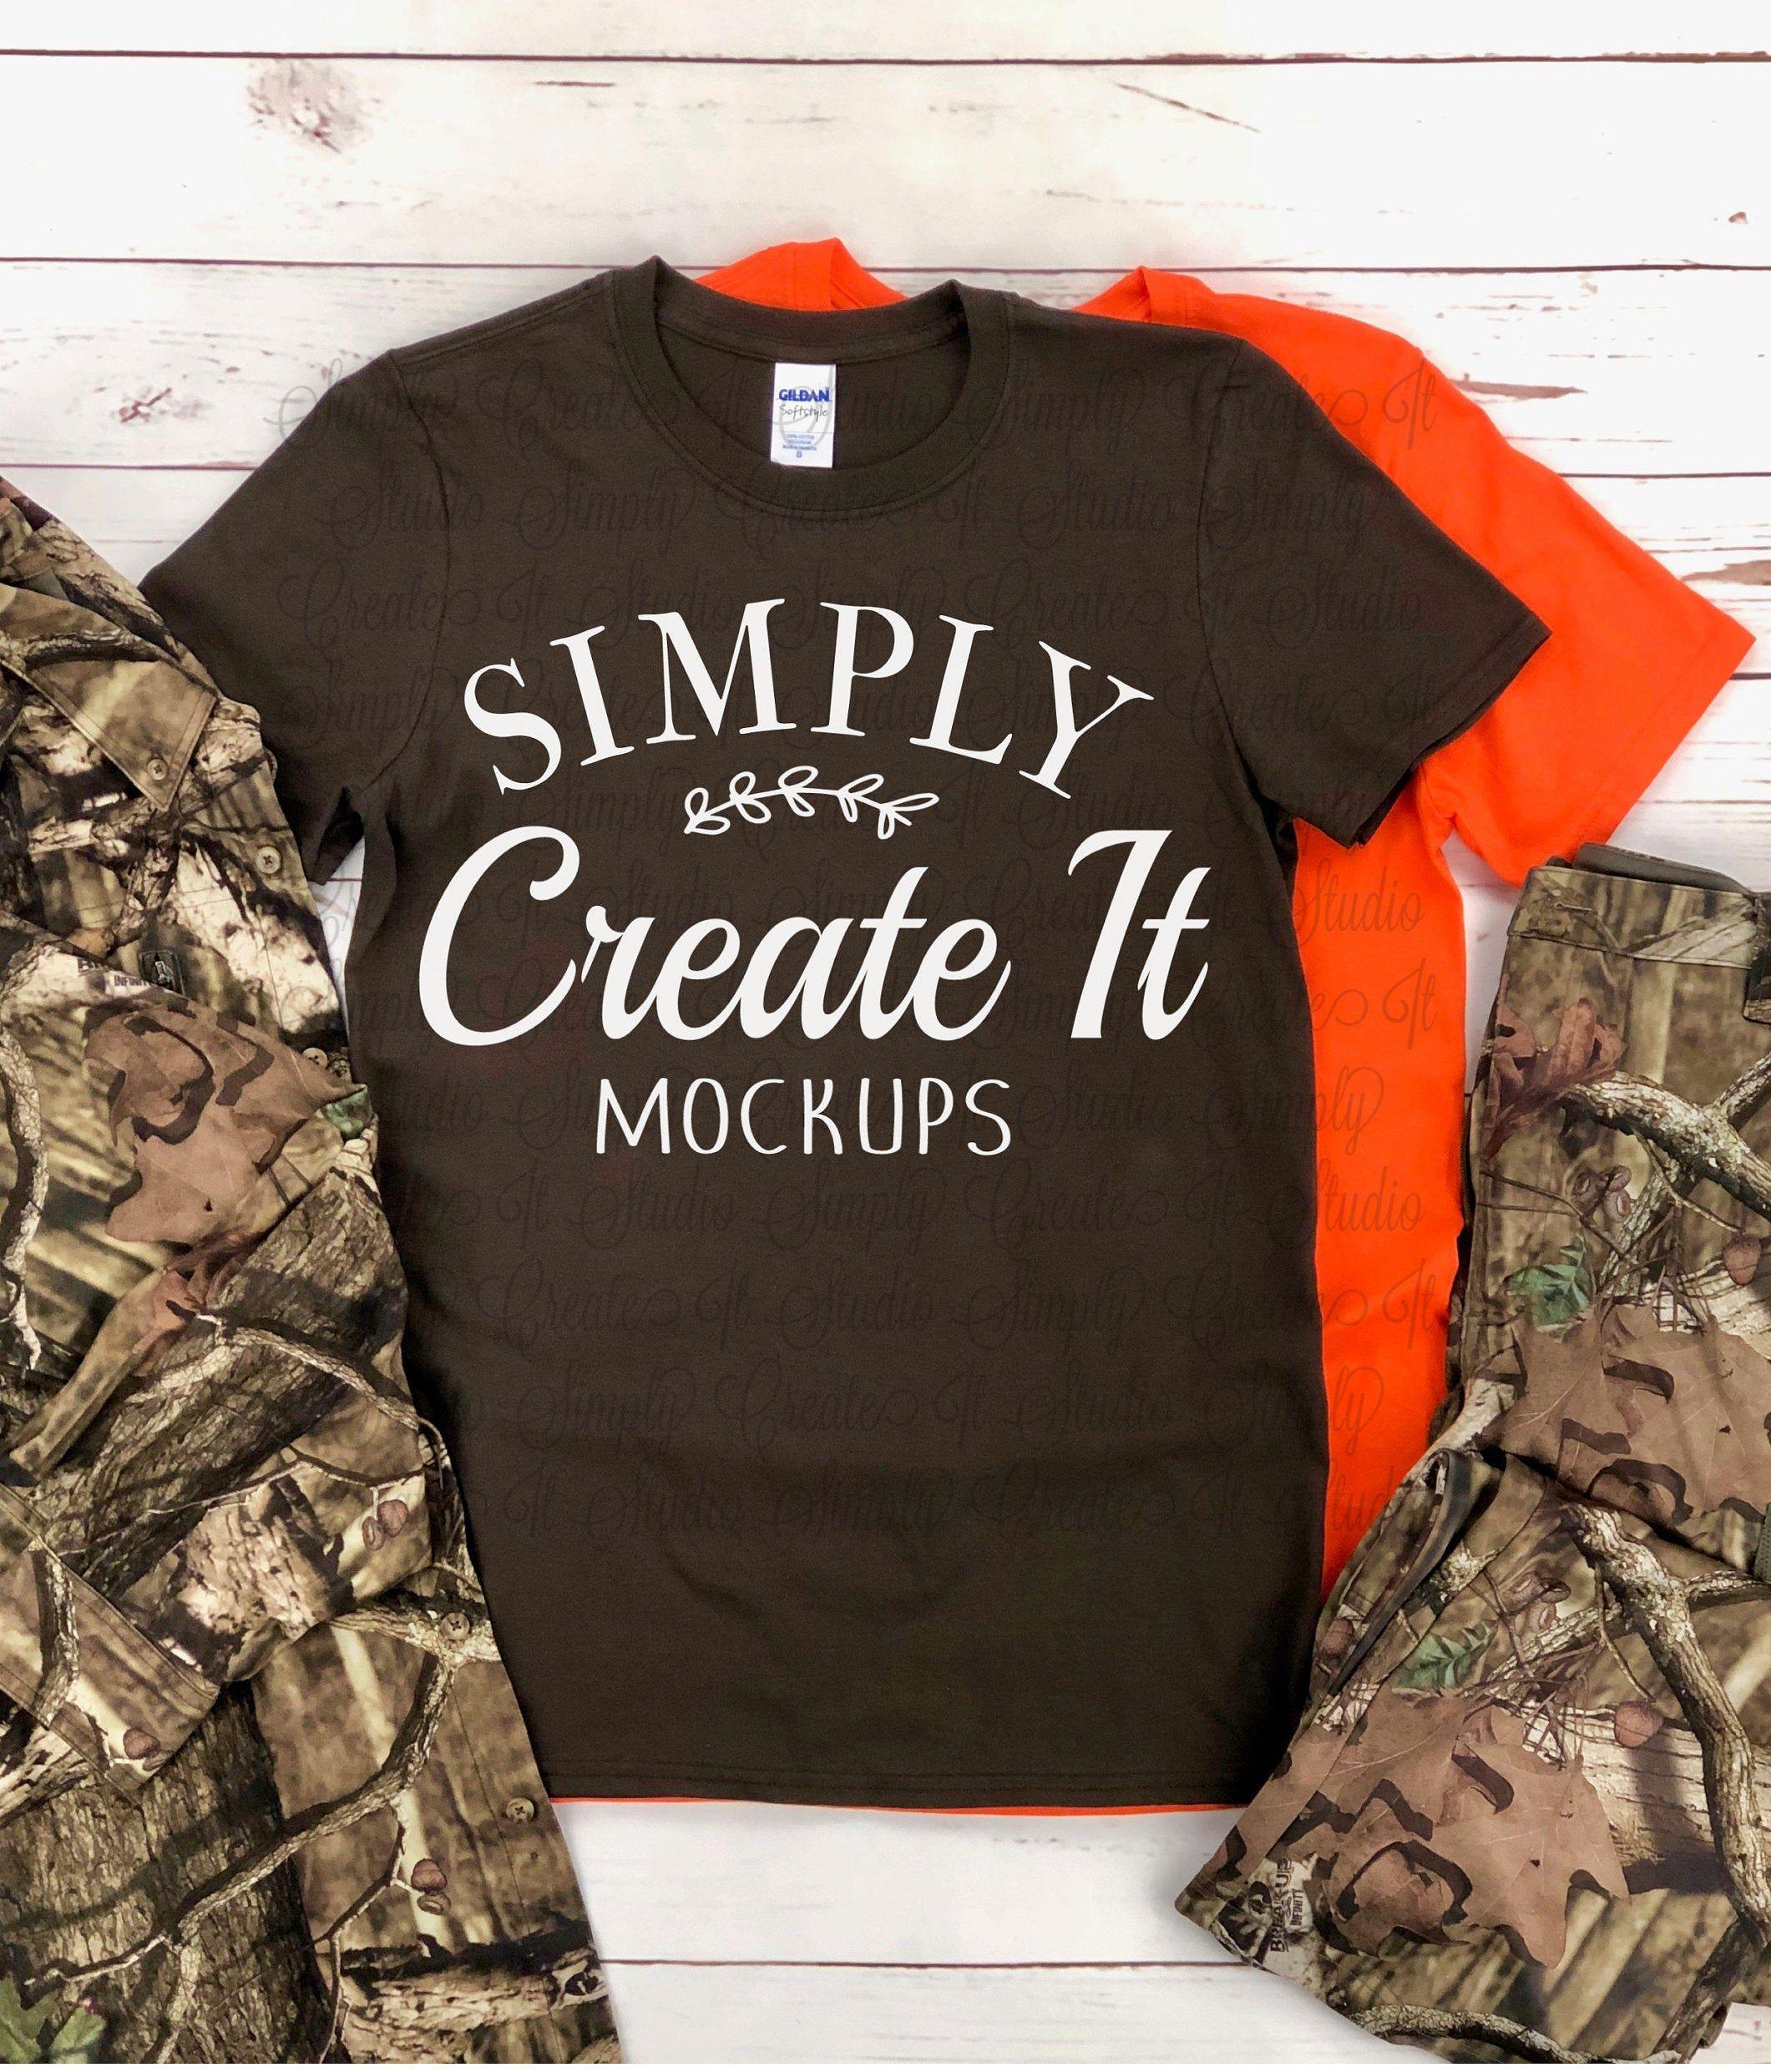 Gildan Brown 64000 Men's Camo mockup, 64000 Orange, Gildan 64000, mockup, t-shirt mockup, Flat Lay mockup, Gildan, Brown unisex adult shirt